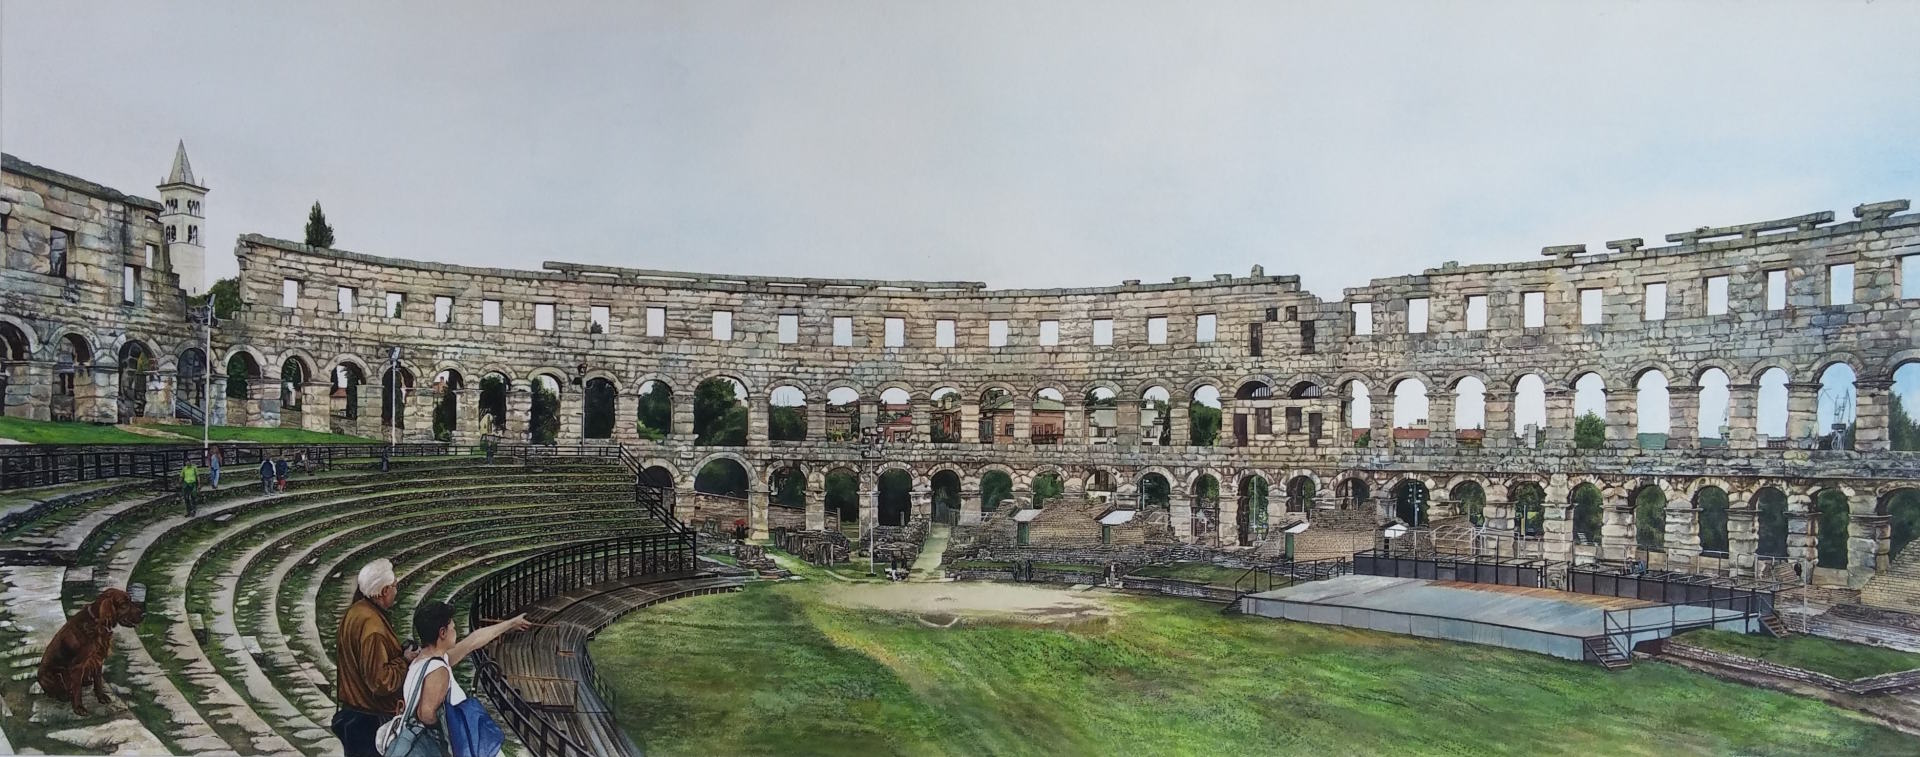 Colosseum Arena, Pula Croatia